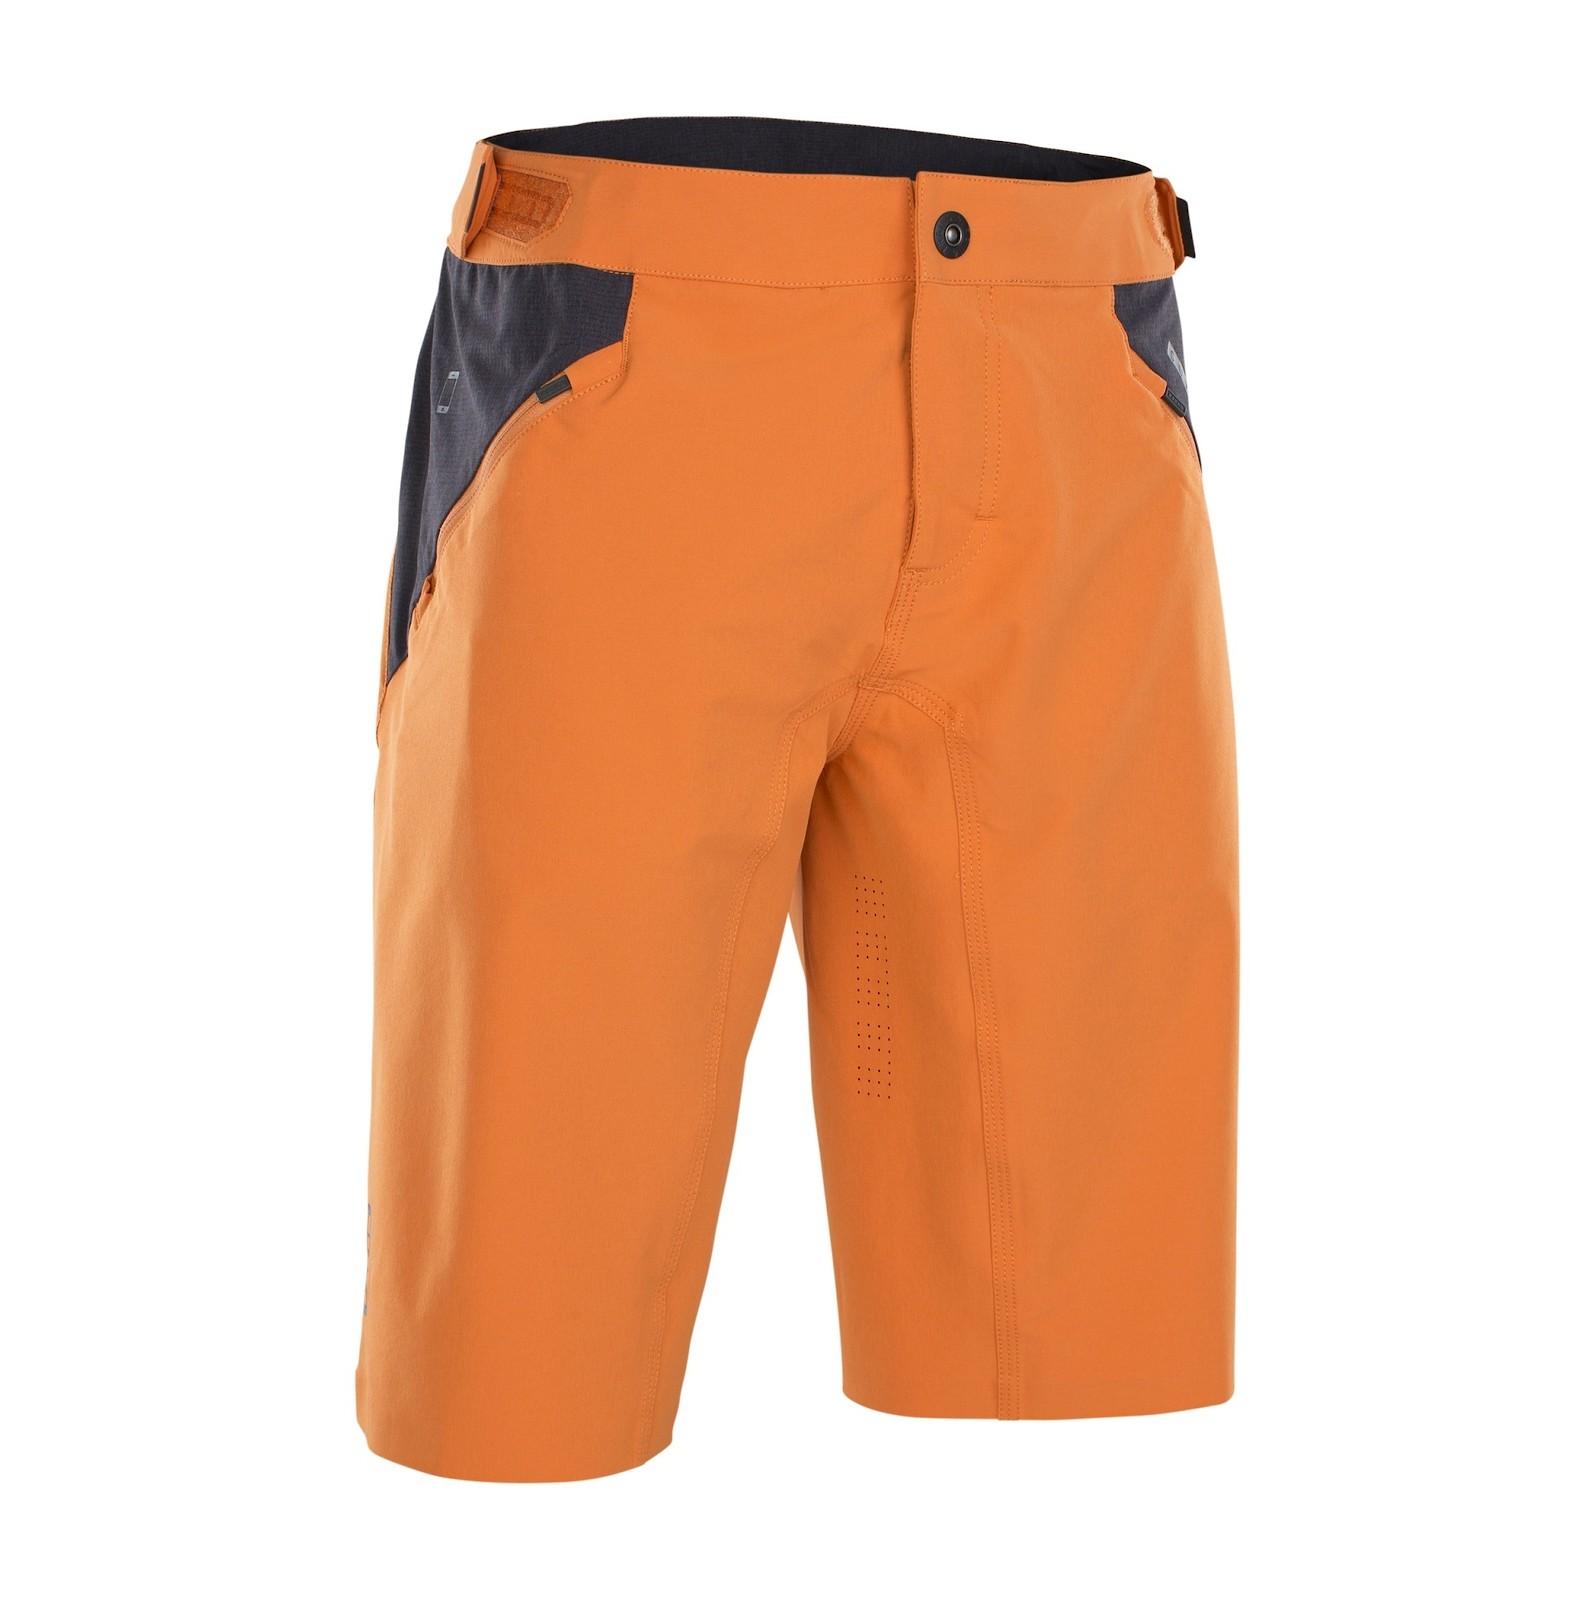 2020 Traze Amp Bike Short (riot orange)